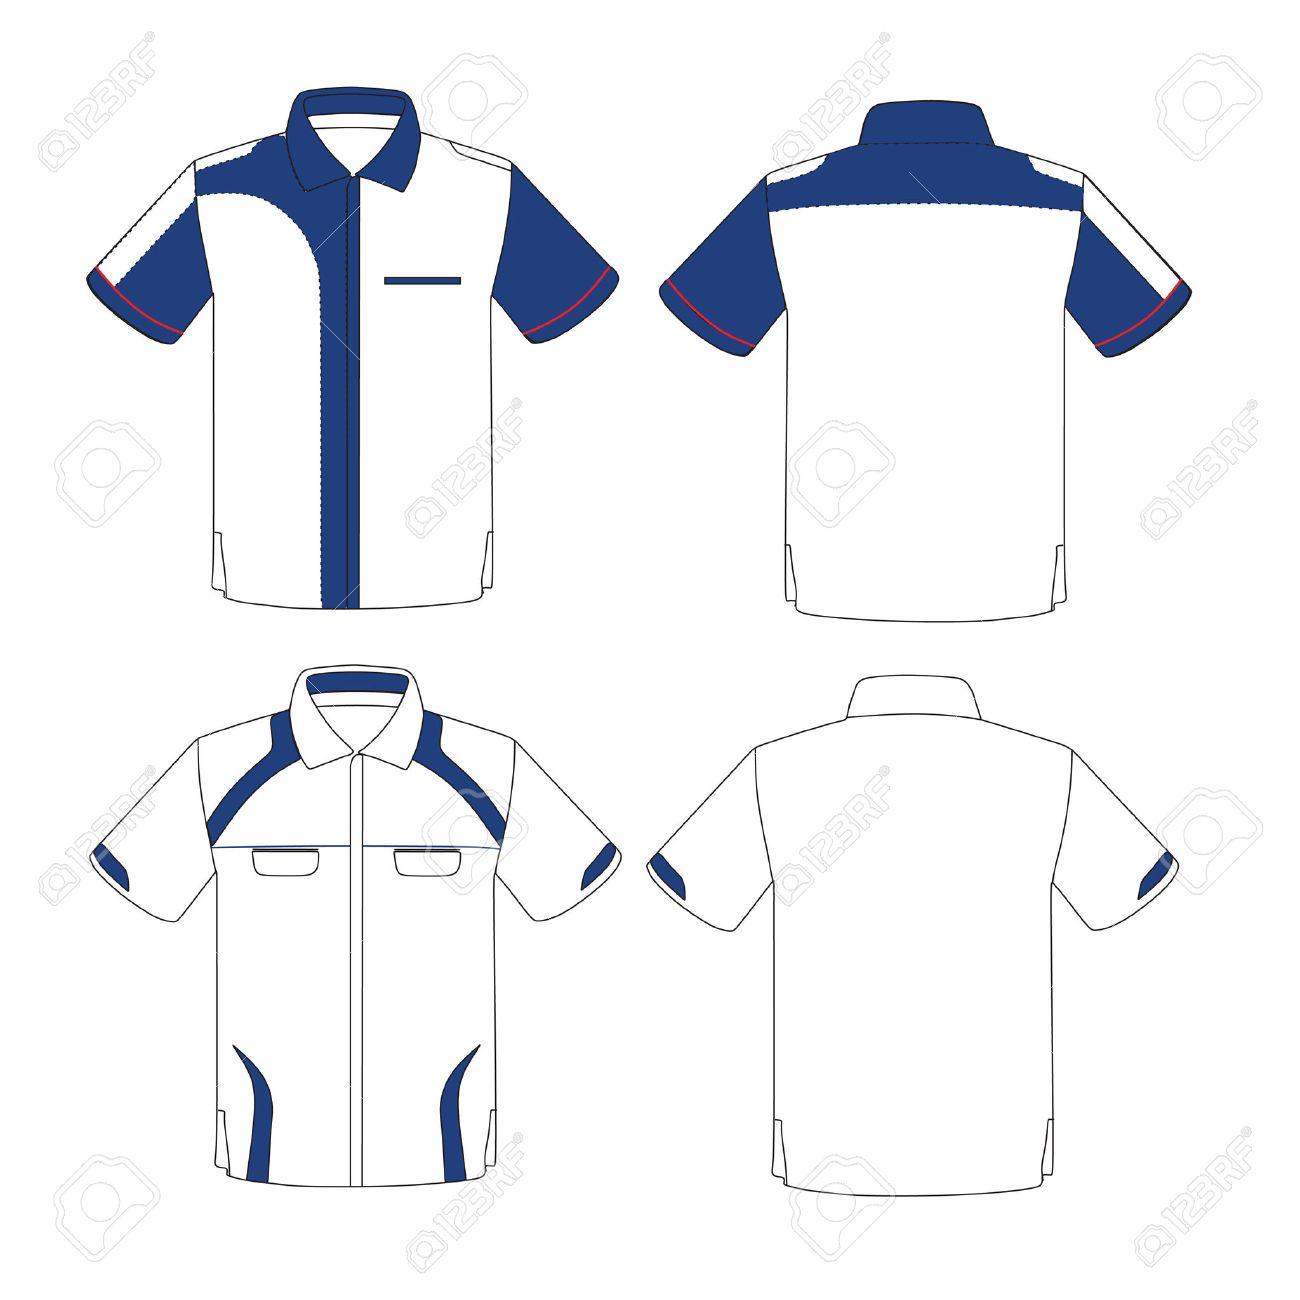 Blank baseball jersey template eliolera blank baseball jersey template eliolera pronofoot35fo Image collections